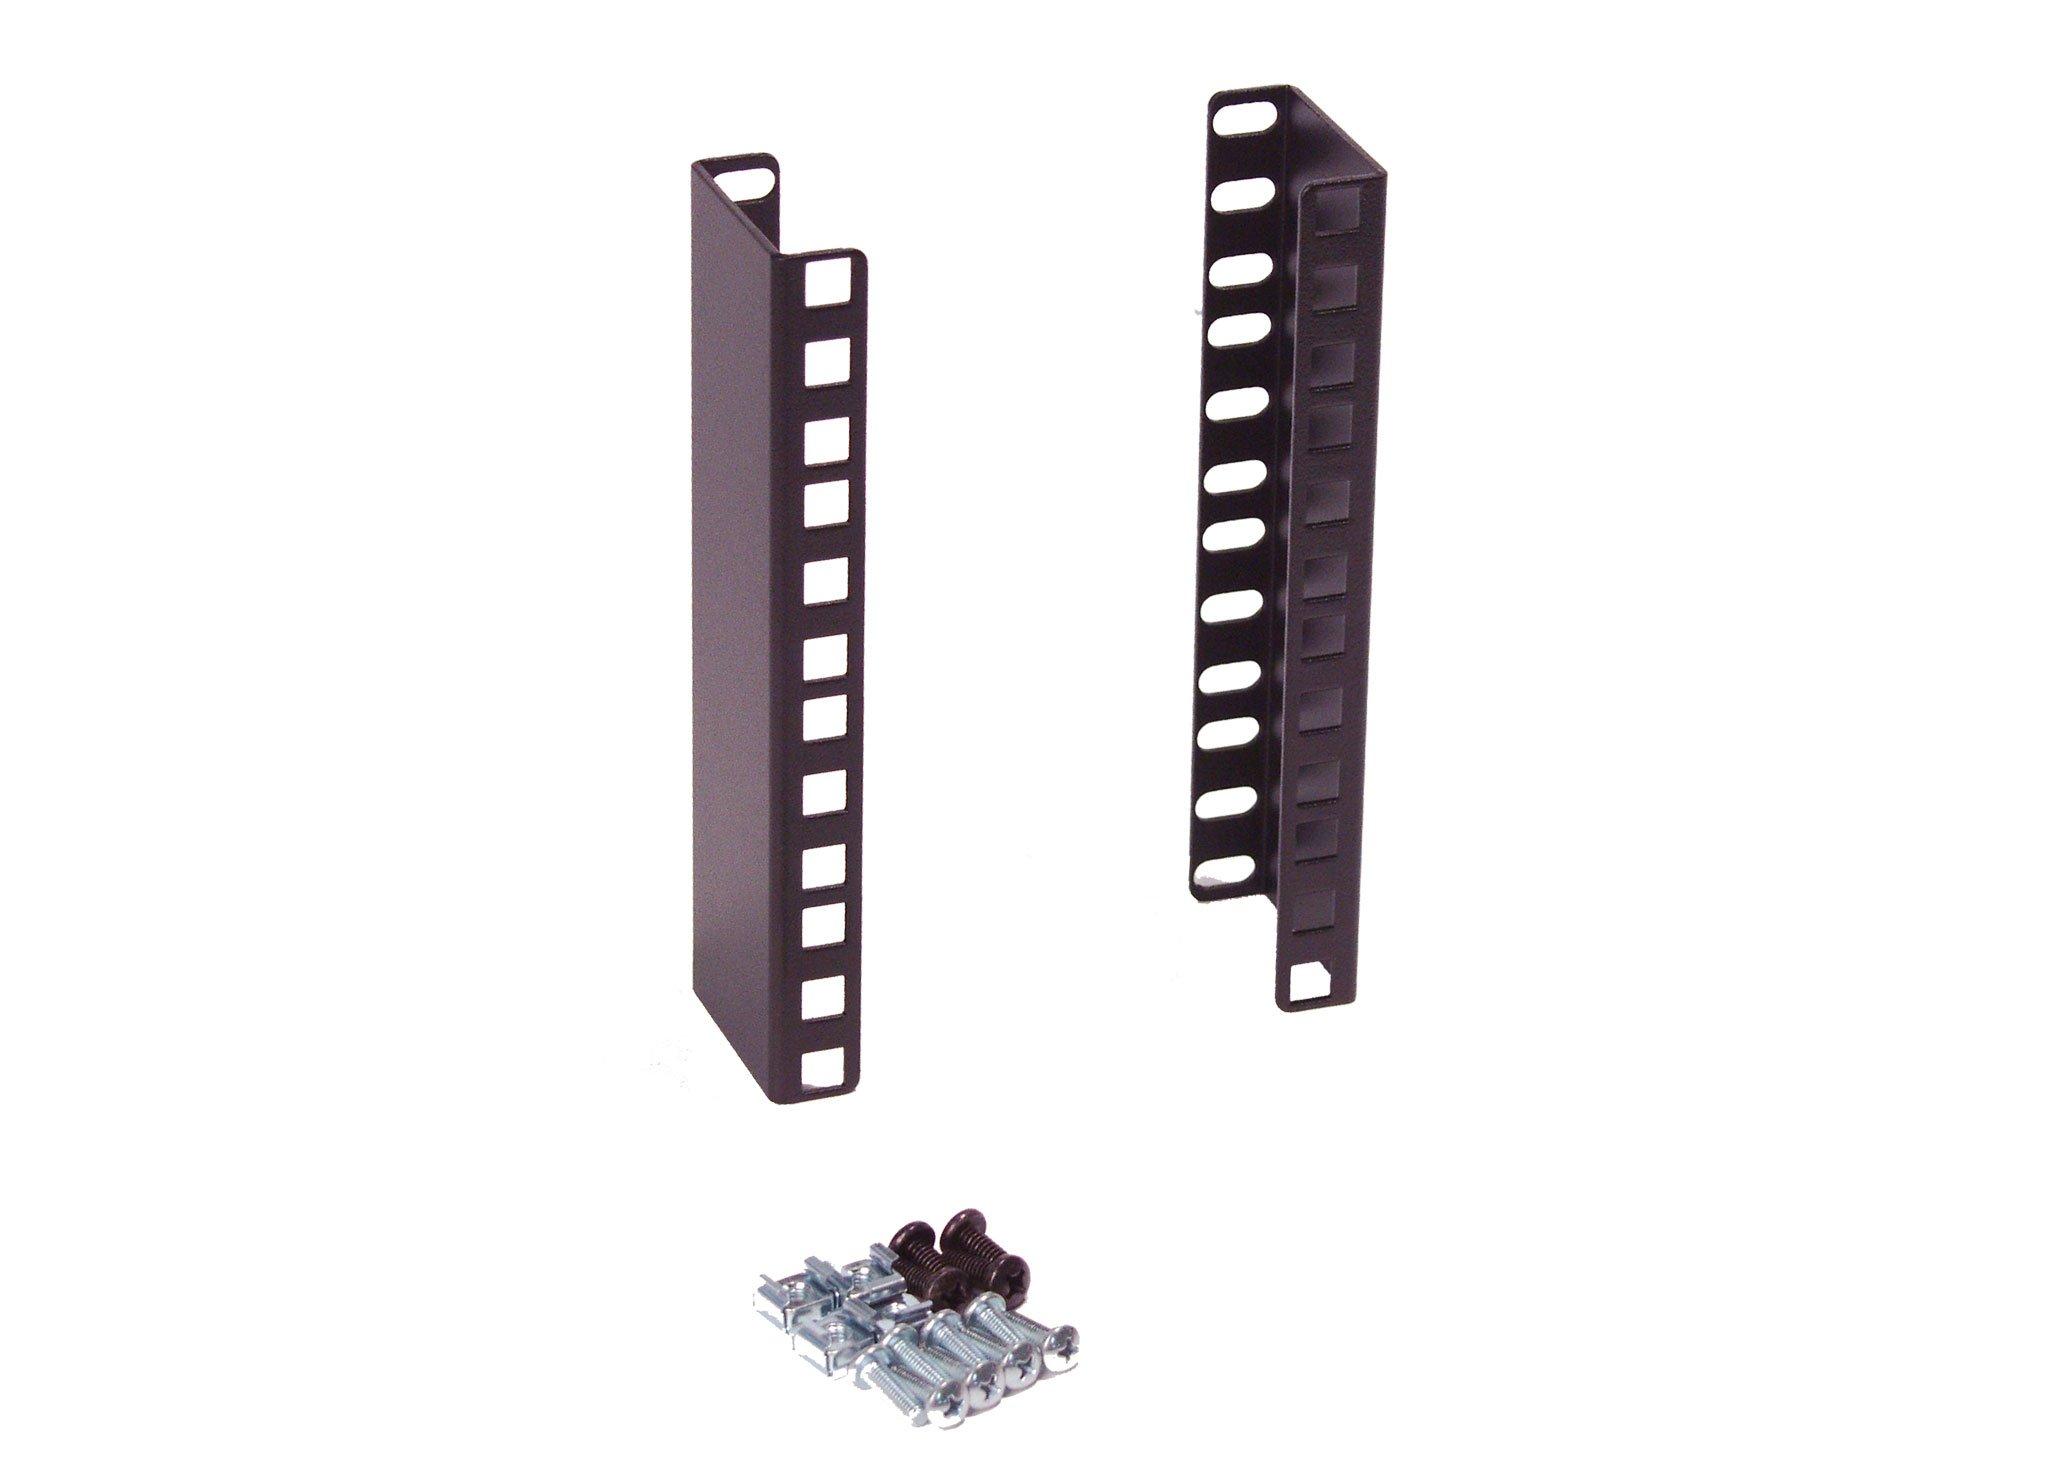 IAB102V10-4U 4U 2 inch Rack Extender for Industrial Standard 19 inch 2 Post or 4 Post Rack Cabinet.